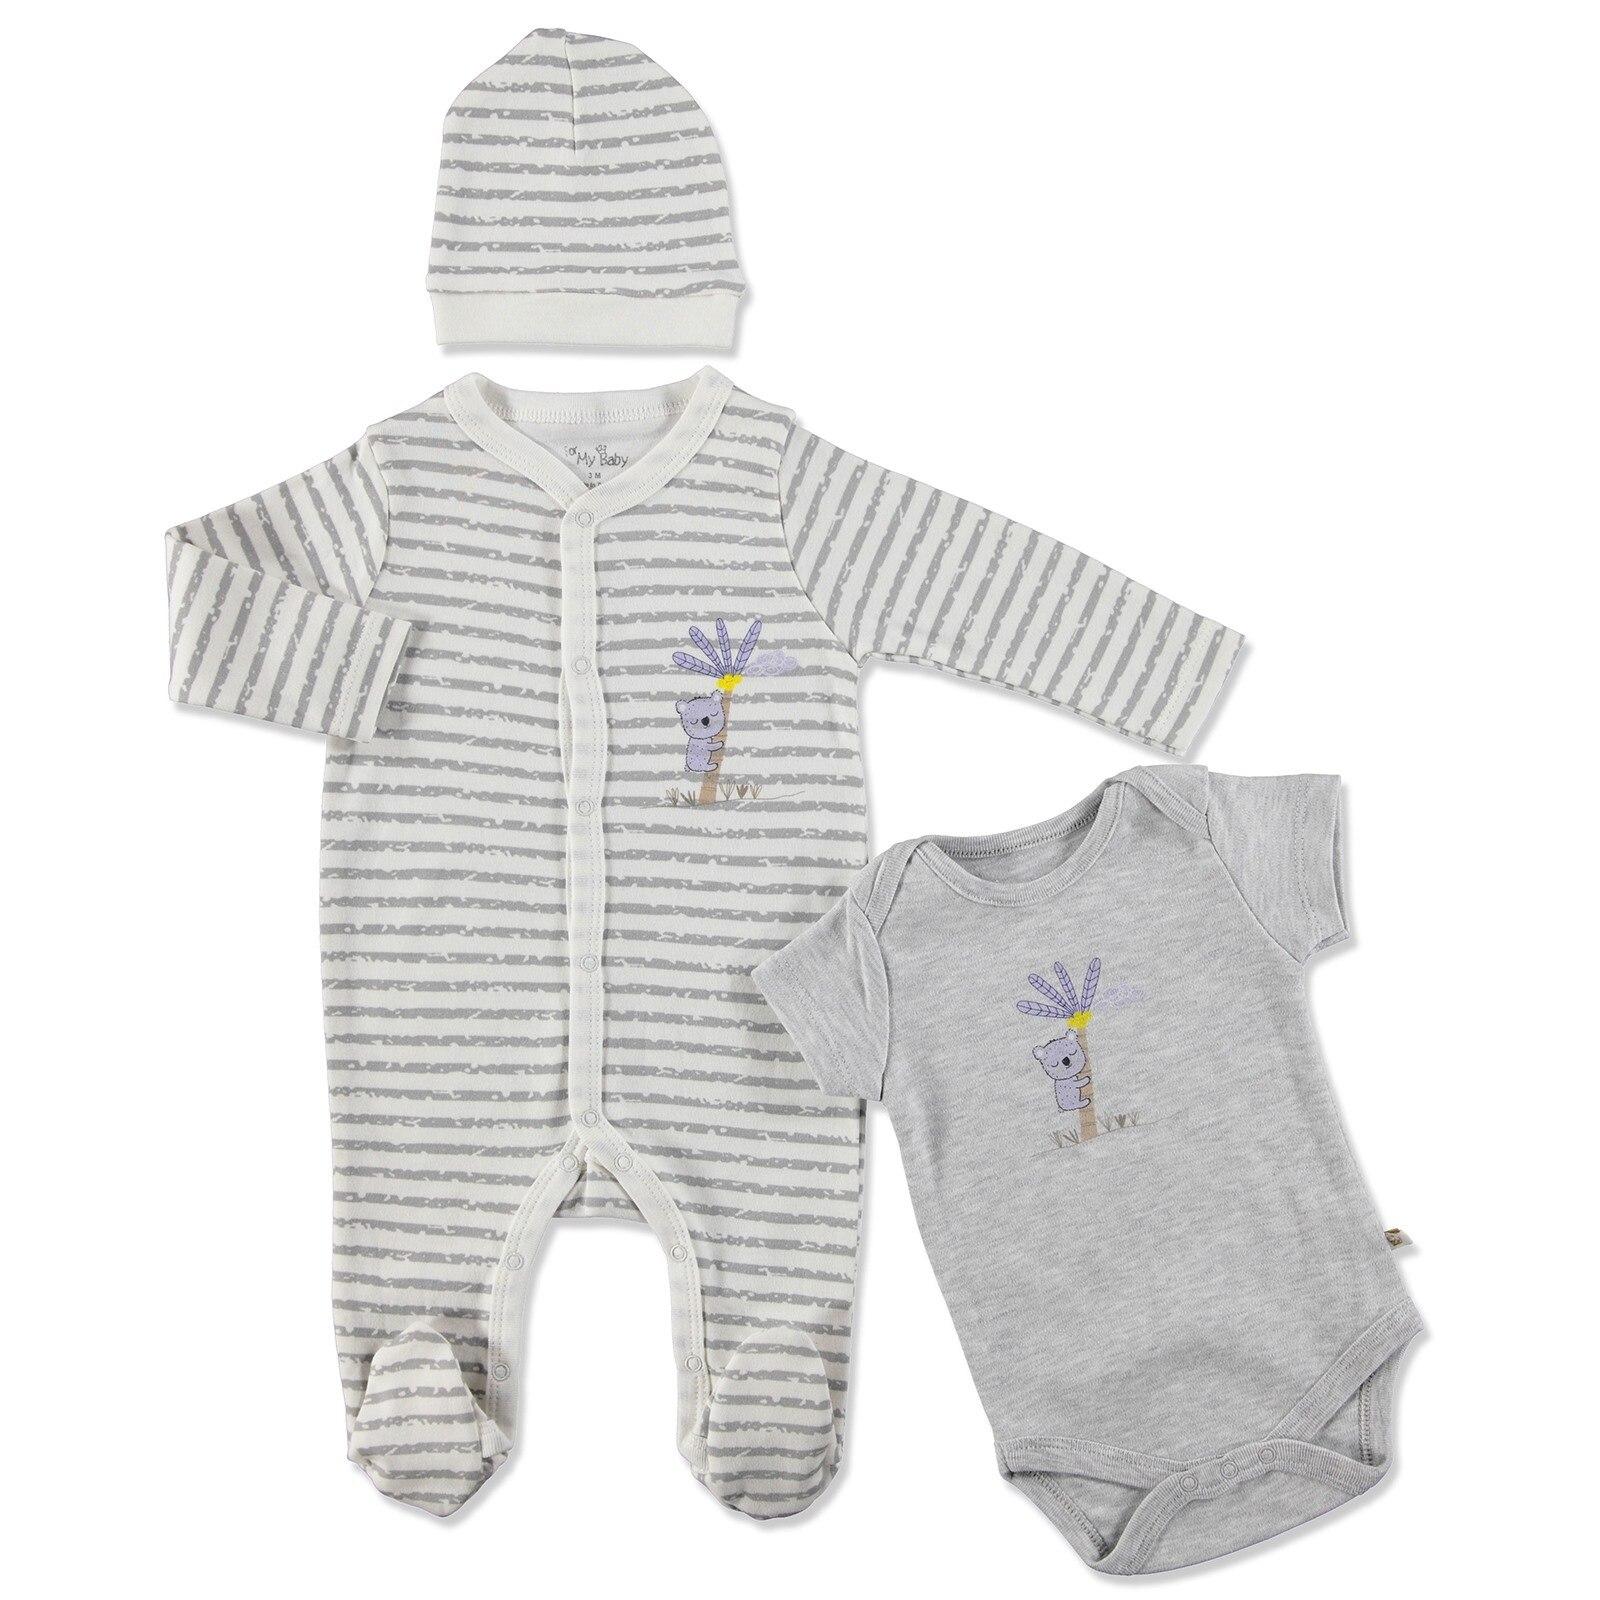 Ebebek For My Baby Summer Boy Koala Romper Bodysuit Hat 3 Pcs Set